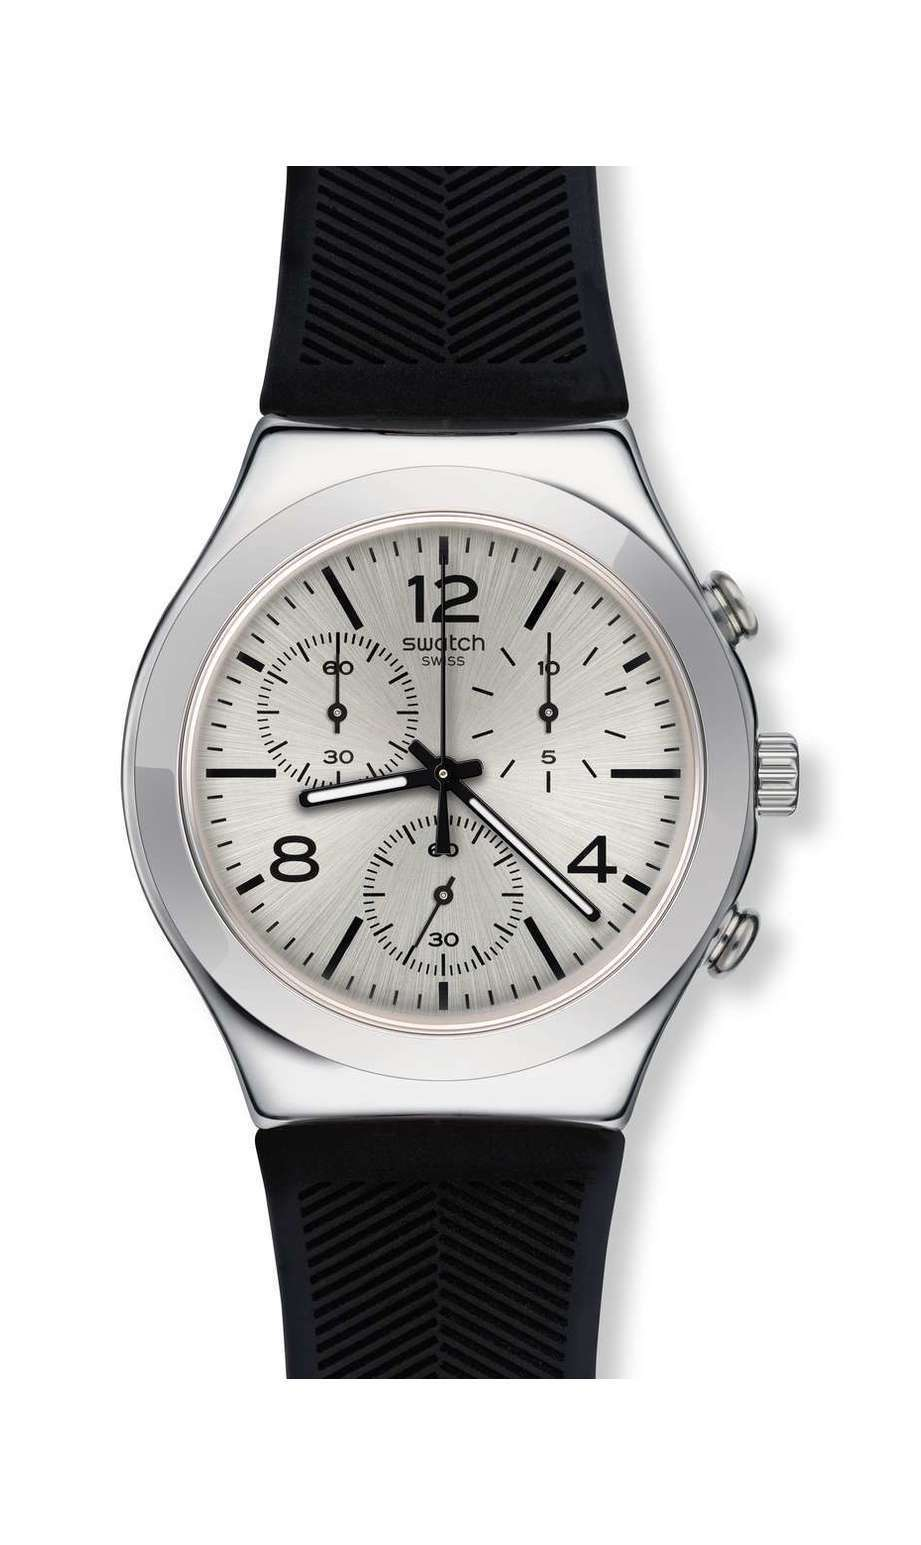 Swatch - NERAMENTE - 1